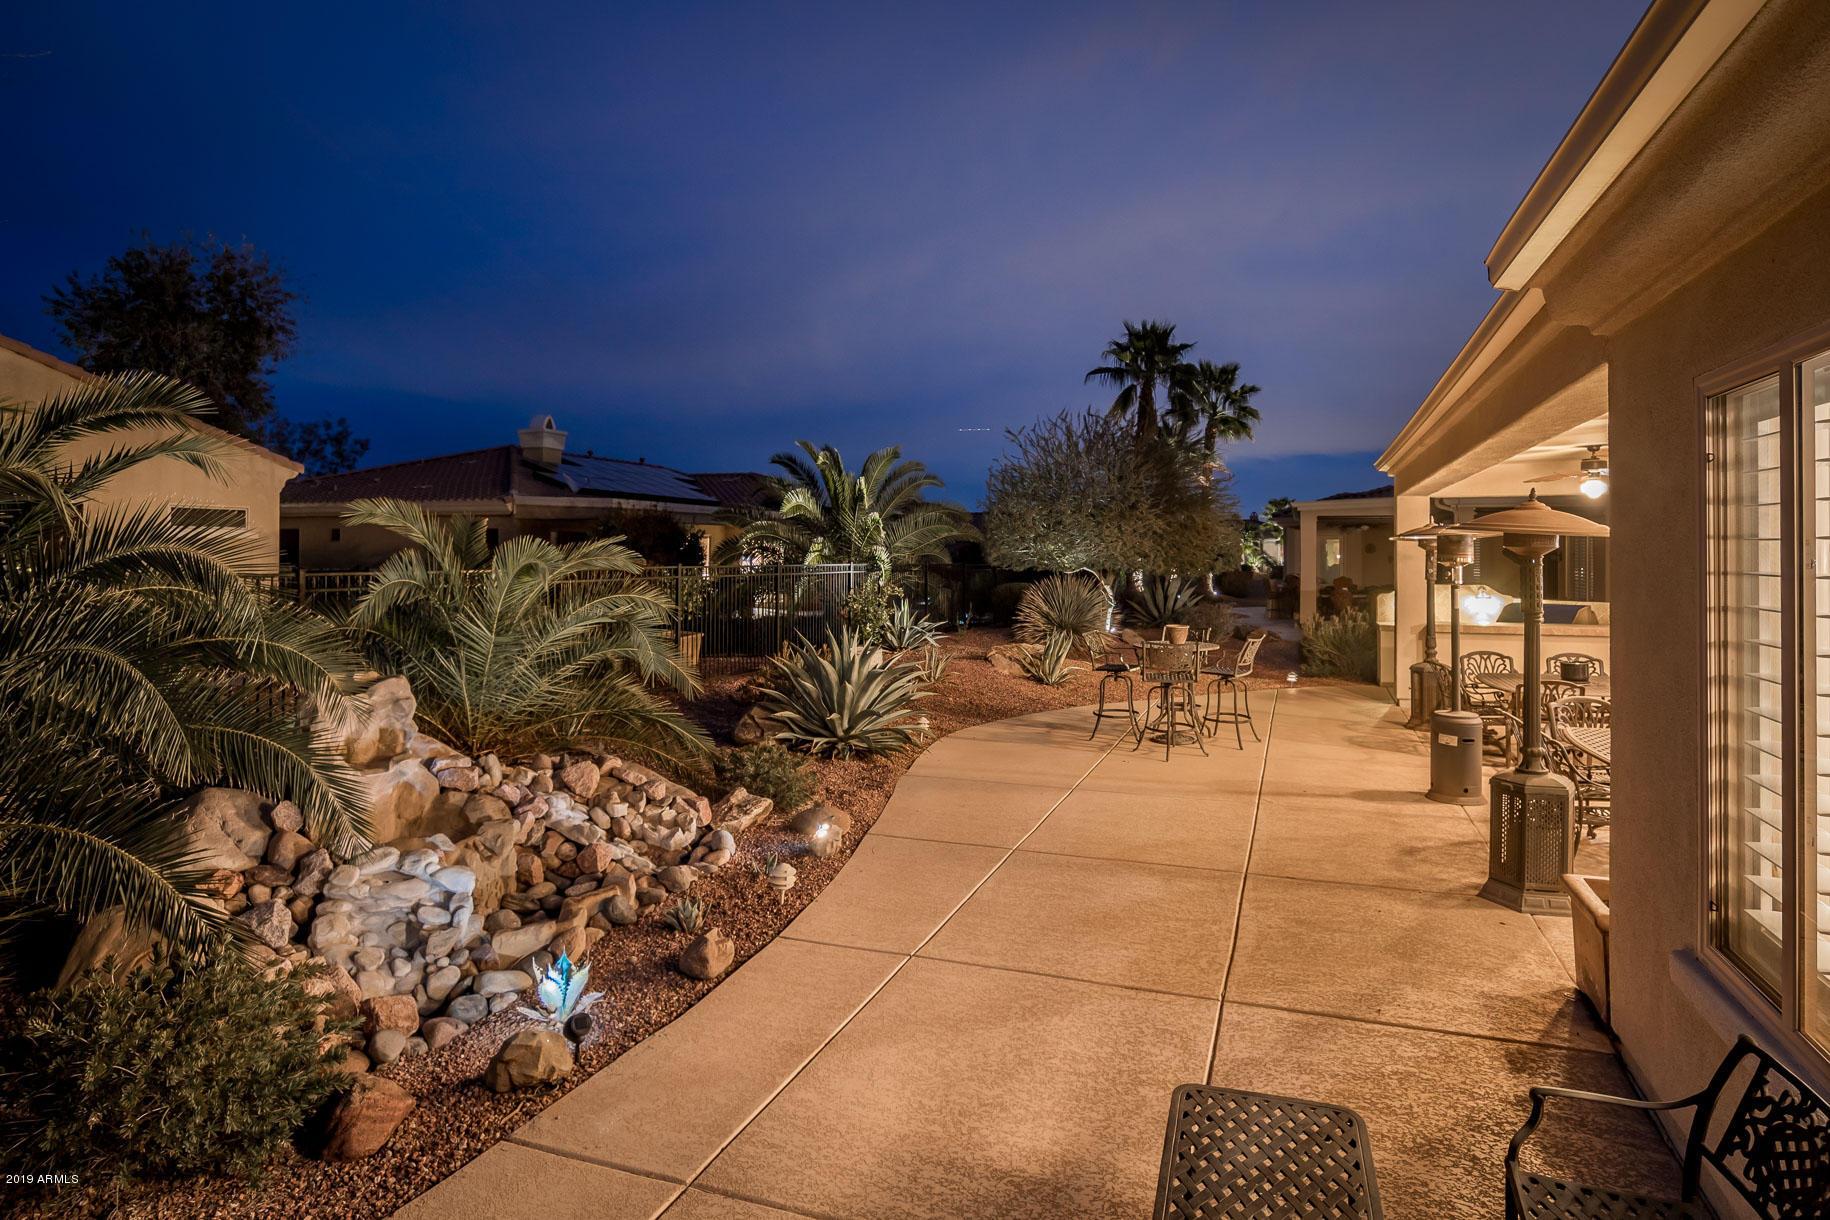 MLS 5888802 13118 W MICHELTORENA Drive, Sun City West, AZ 85375 Sun City West AZ Tennis Court